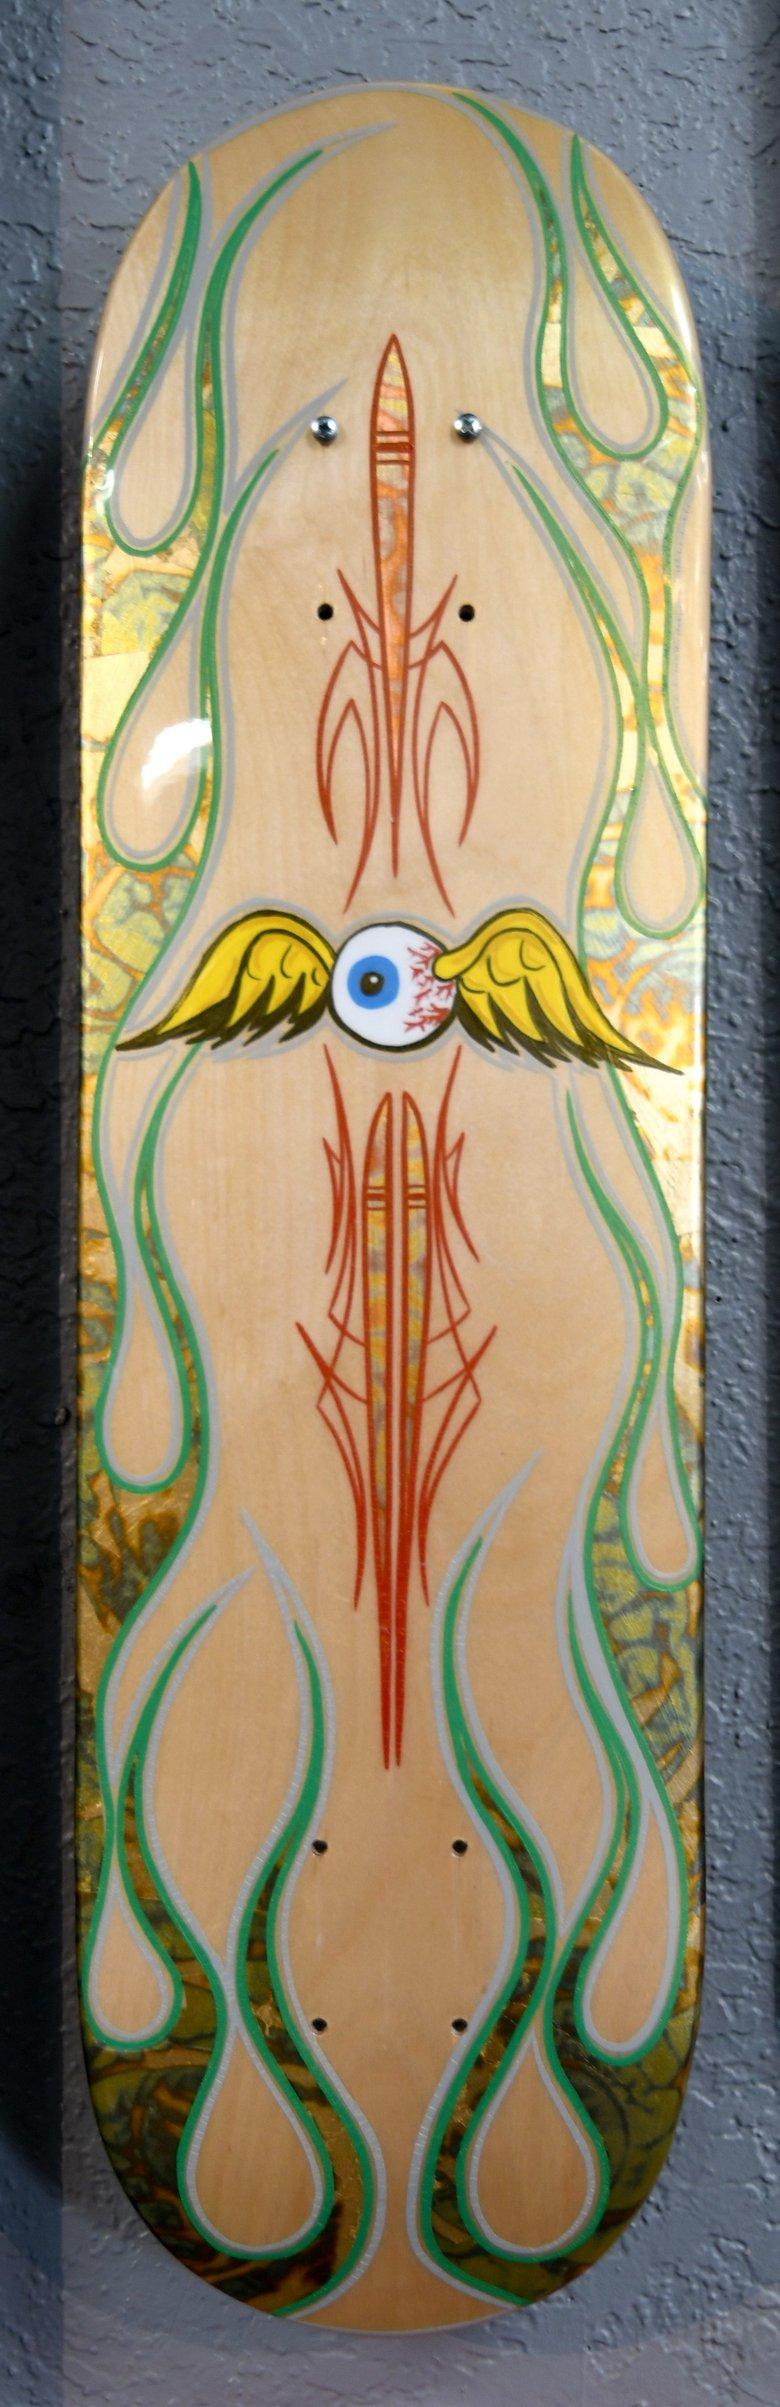 "Image of ""Flyin Eyeball"" by Mike Jacox"